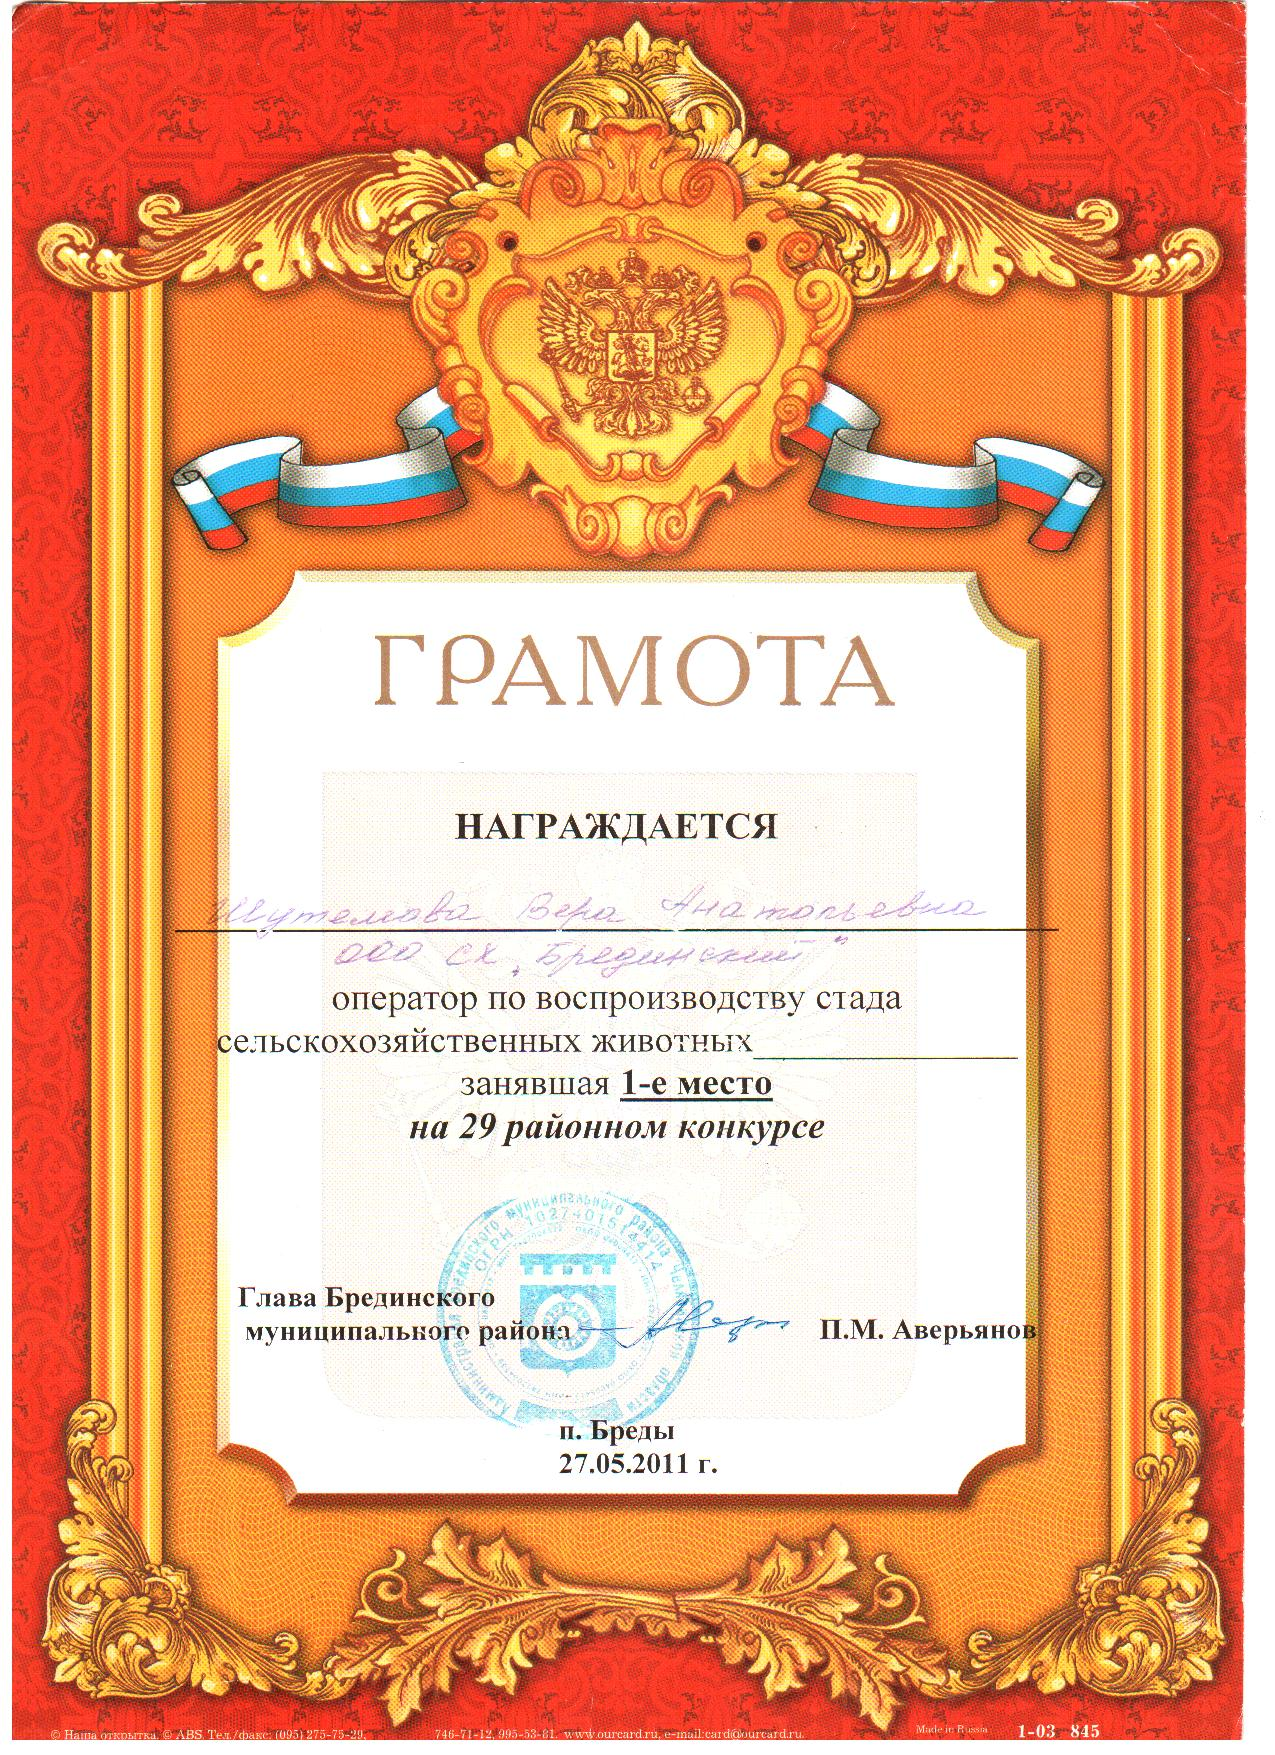 C:\Documents and Settings\Администратор\Рабочий стол\Шутёмова приложение\Изображение 019.jpg